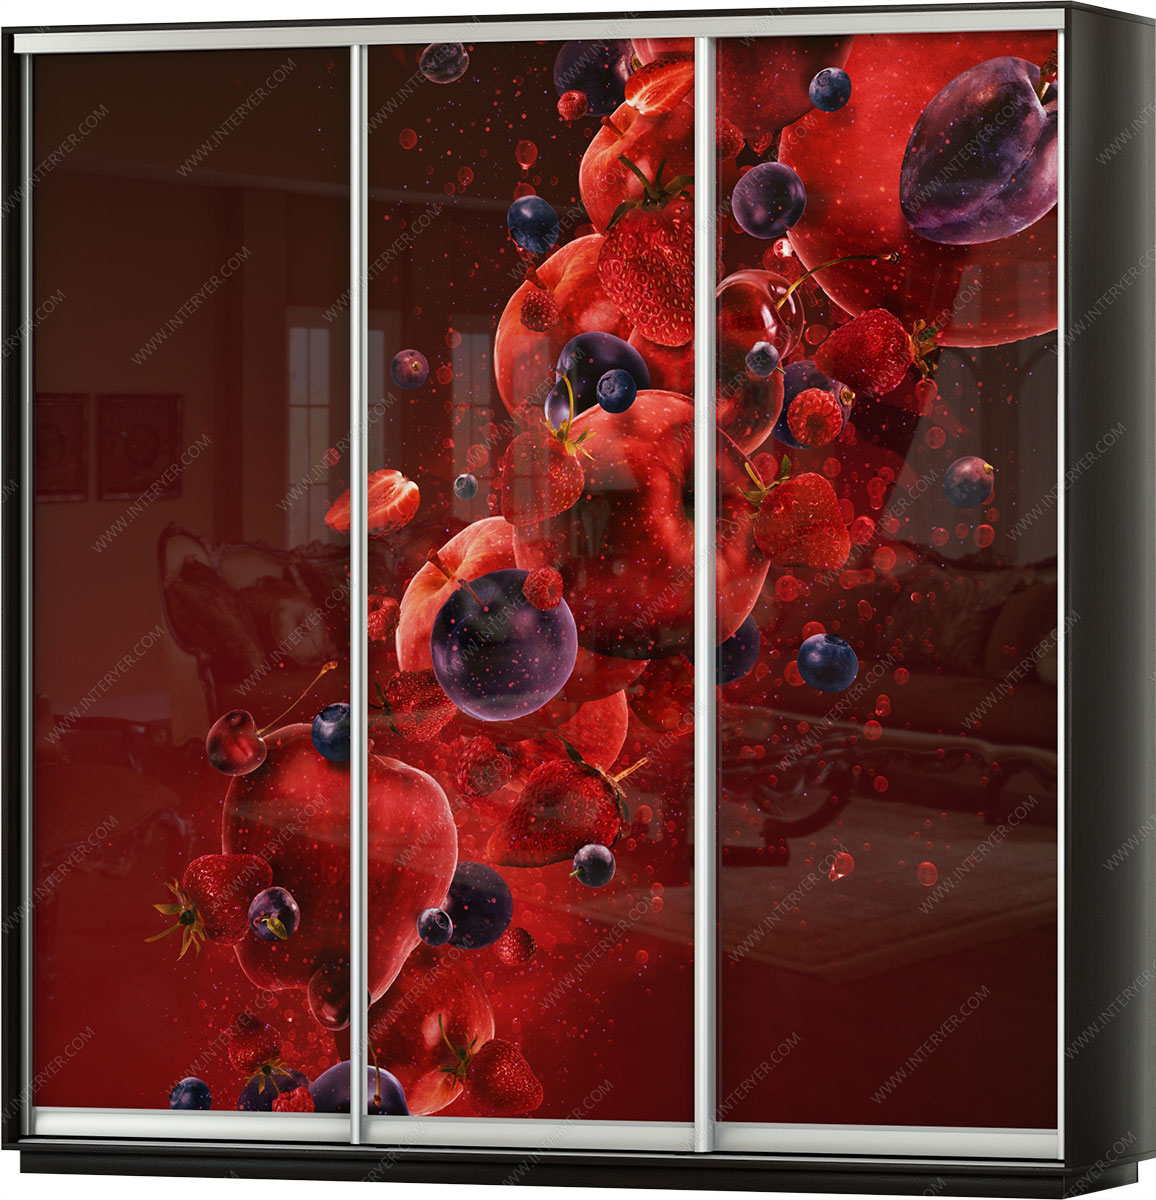 Шкафы купе с рисунками на зеркалах фото владимира